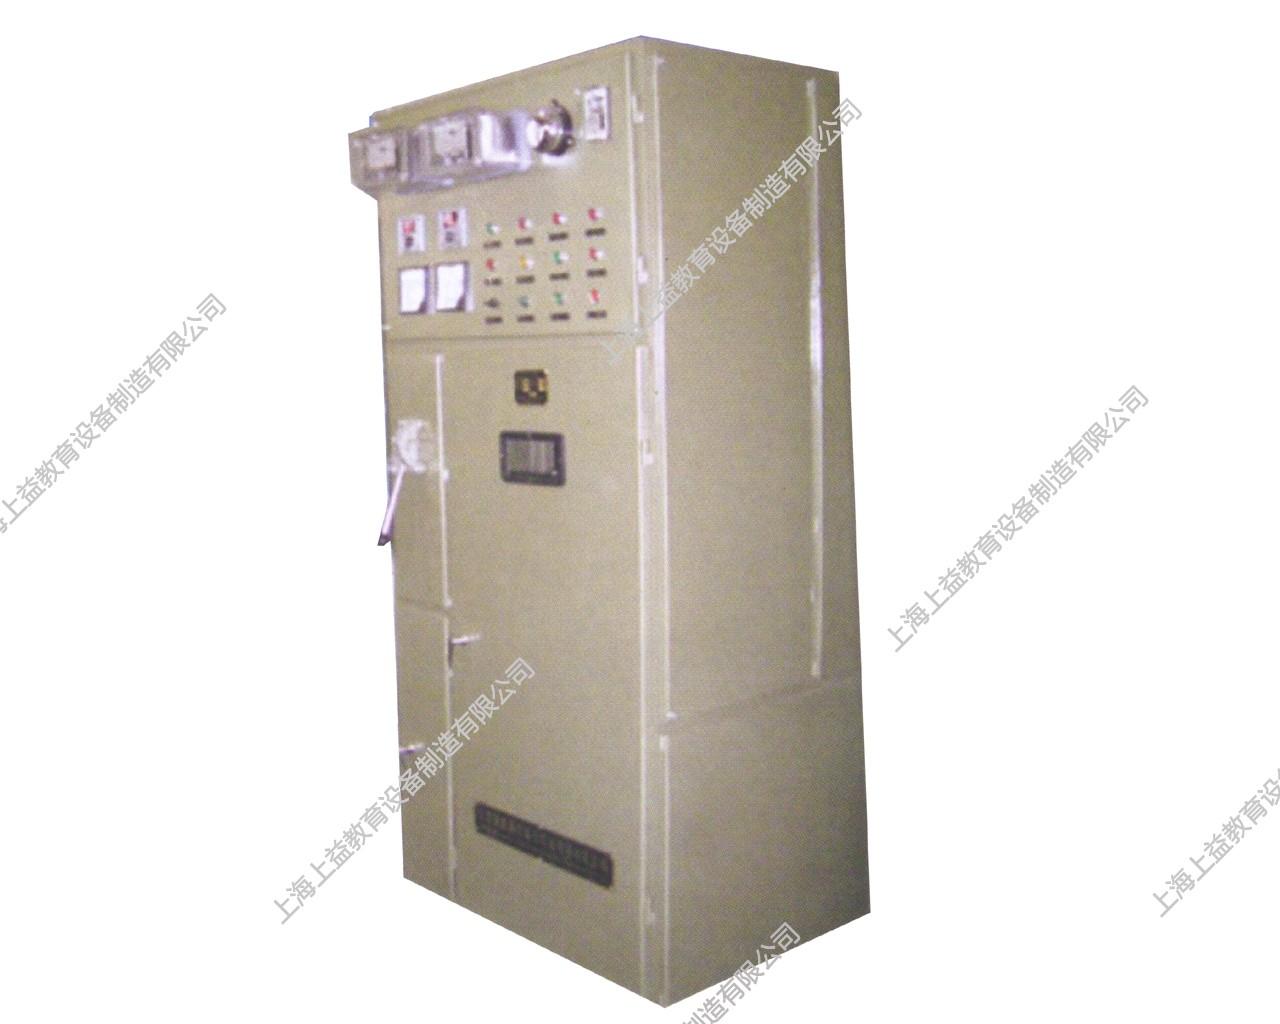 SYGYP-01A 高压配电操作wwwlehu8vip室设备